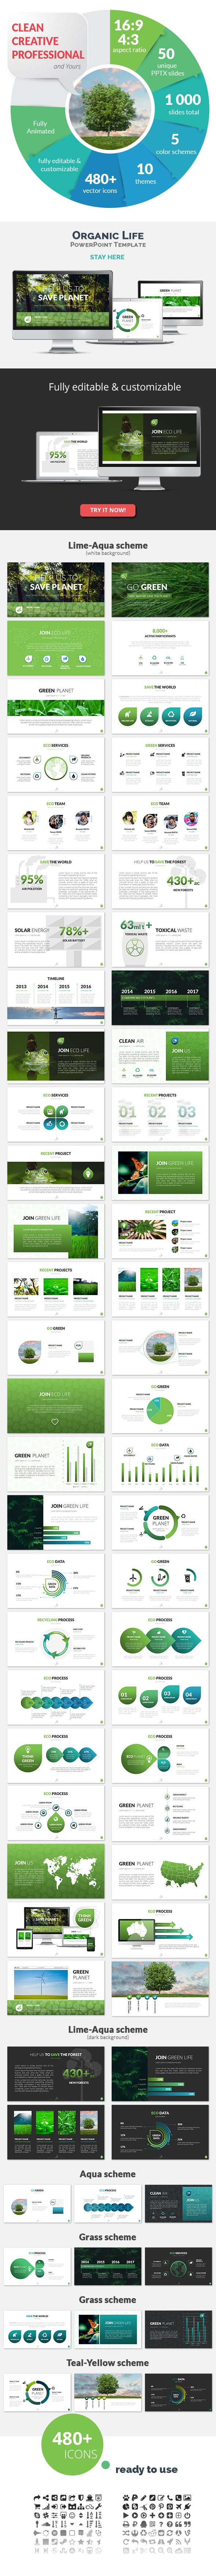 Organic Life PowerPoint Presentation Template - PowerPoint Templates Presentation Templates